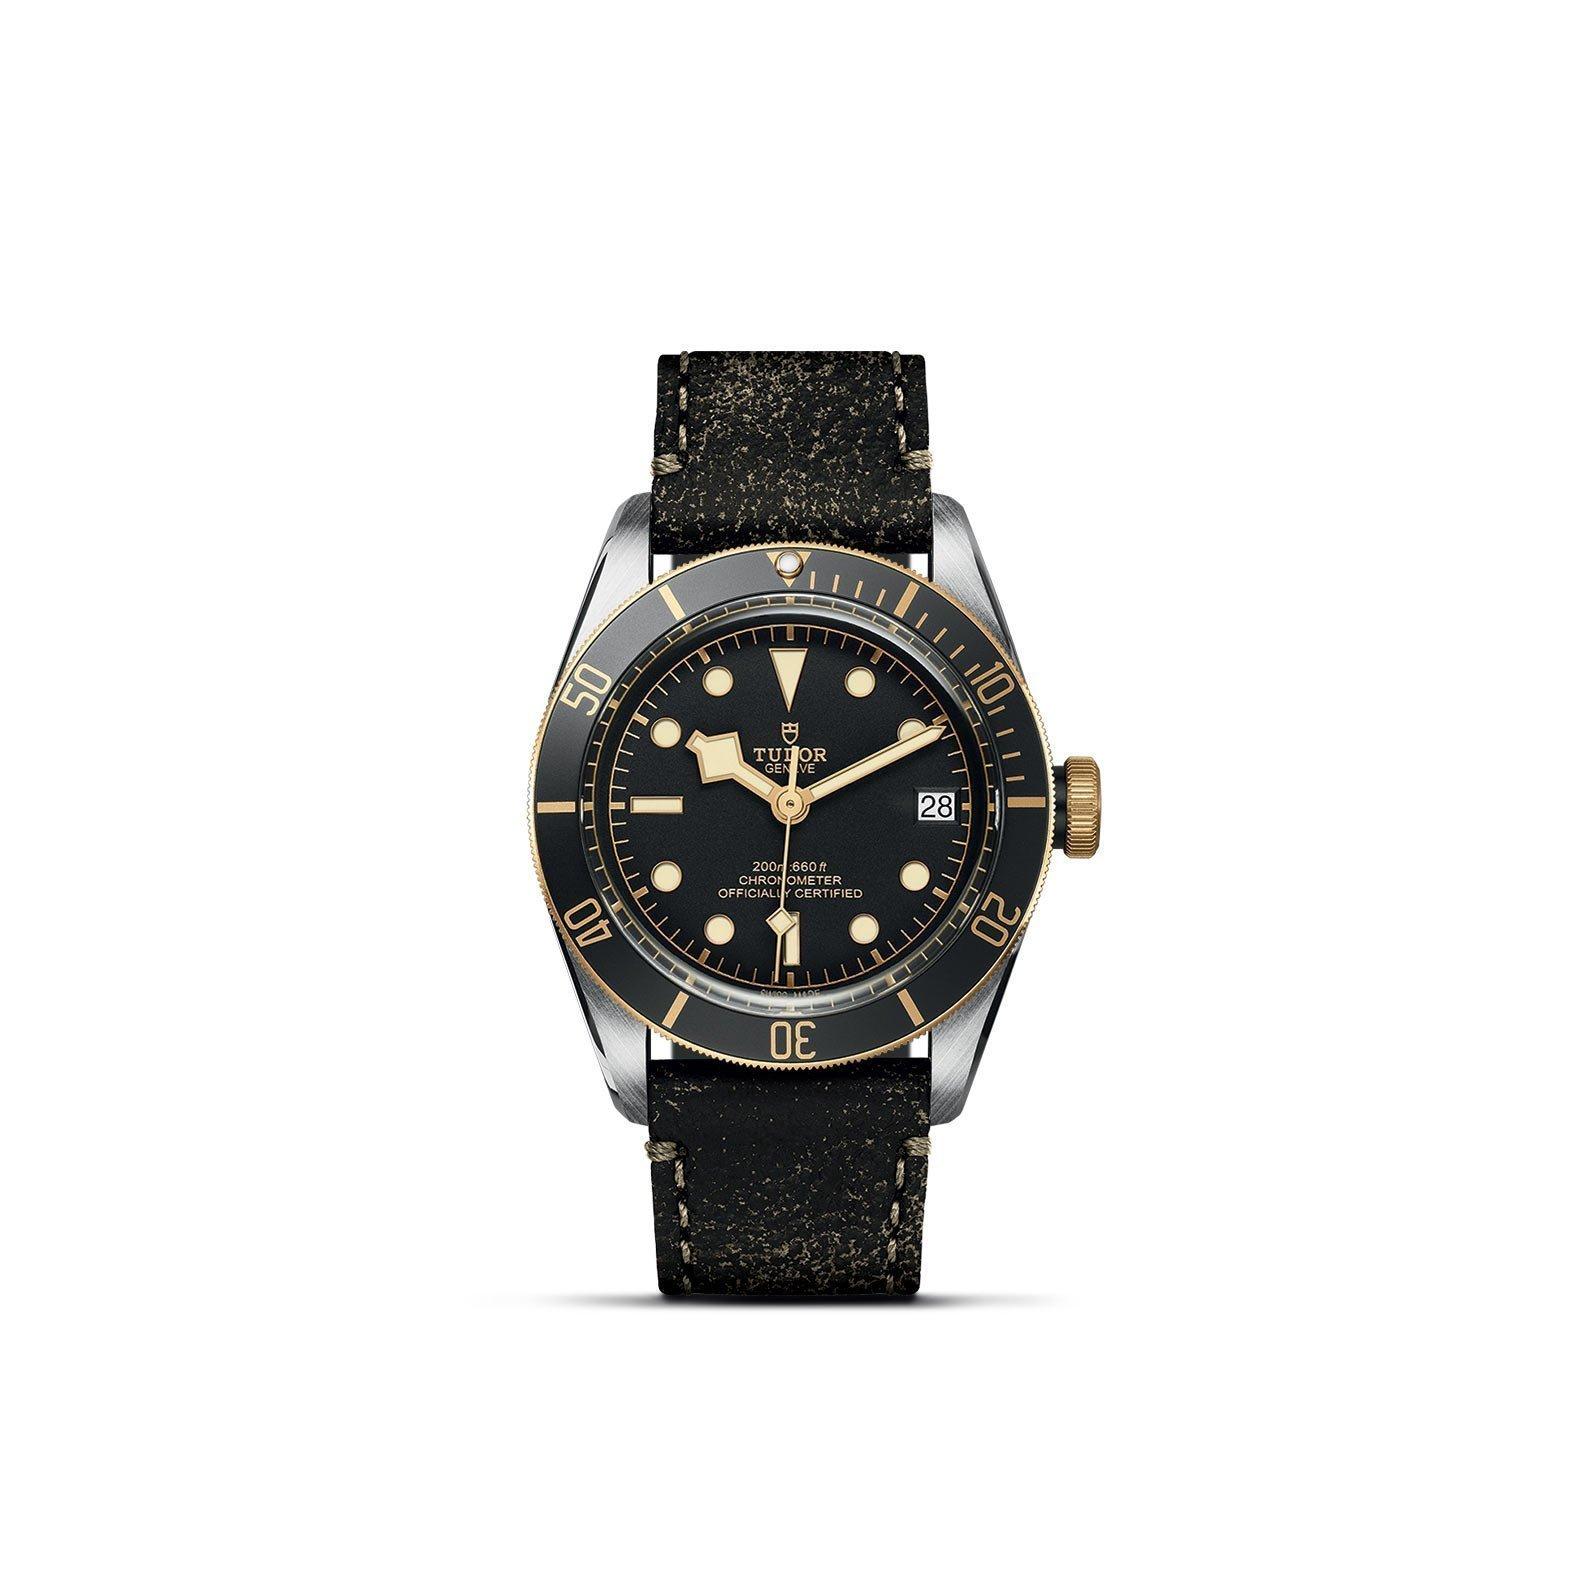 Montre TUDOR Black Bay S&G boîtier en acier, 41mm, bracelet en cuir vieilli vue 1